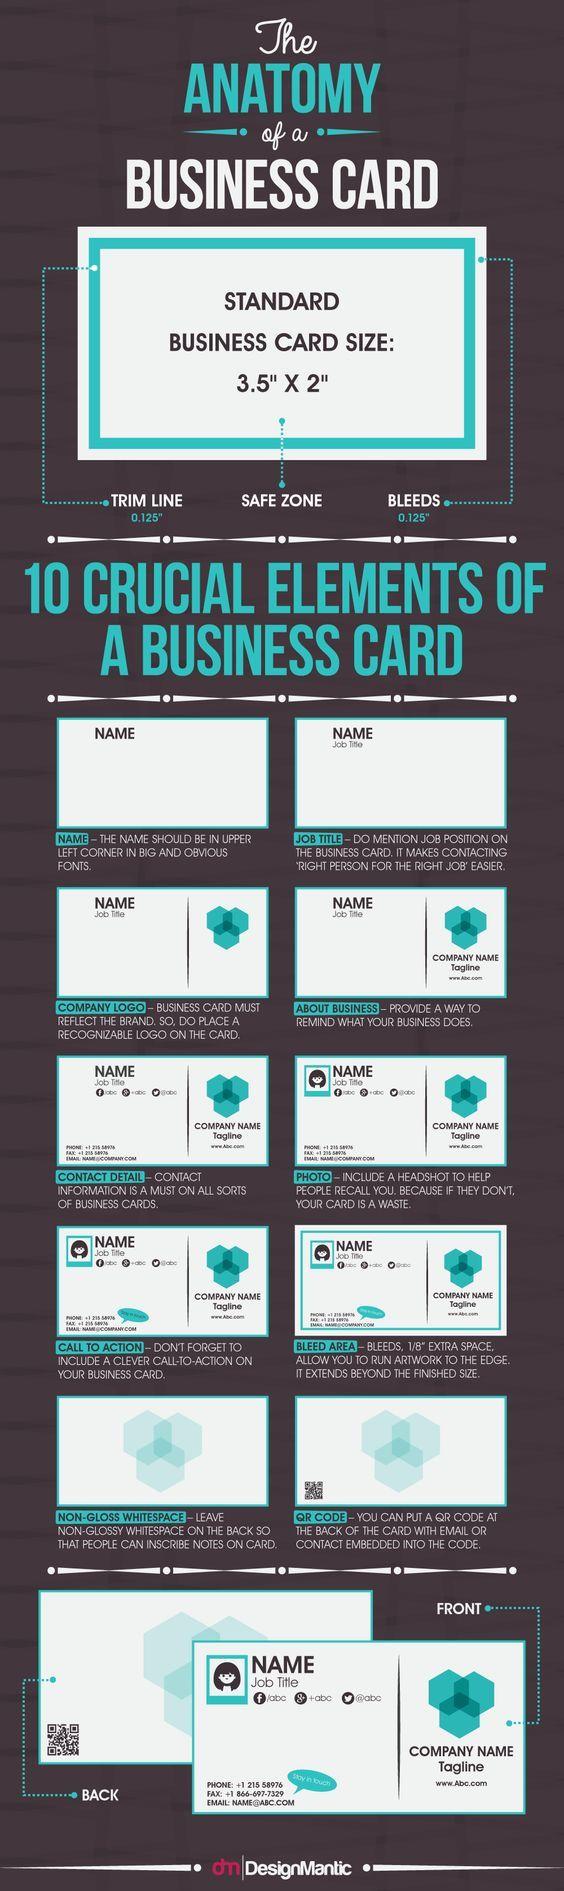 Best 25 business card design software ideas on pinterest black 70 infogrficos que todo designer deve conhecer professional business cardsa magicingreecefo Choice Image